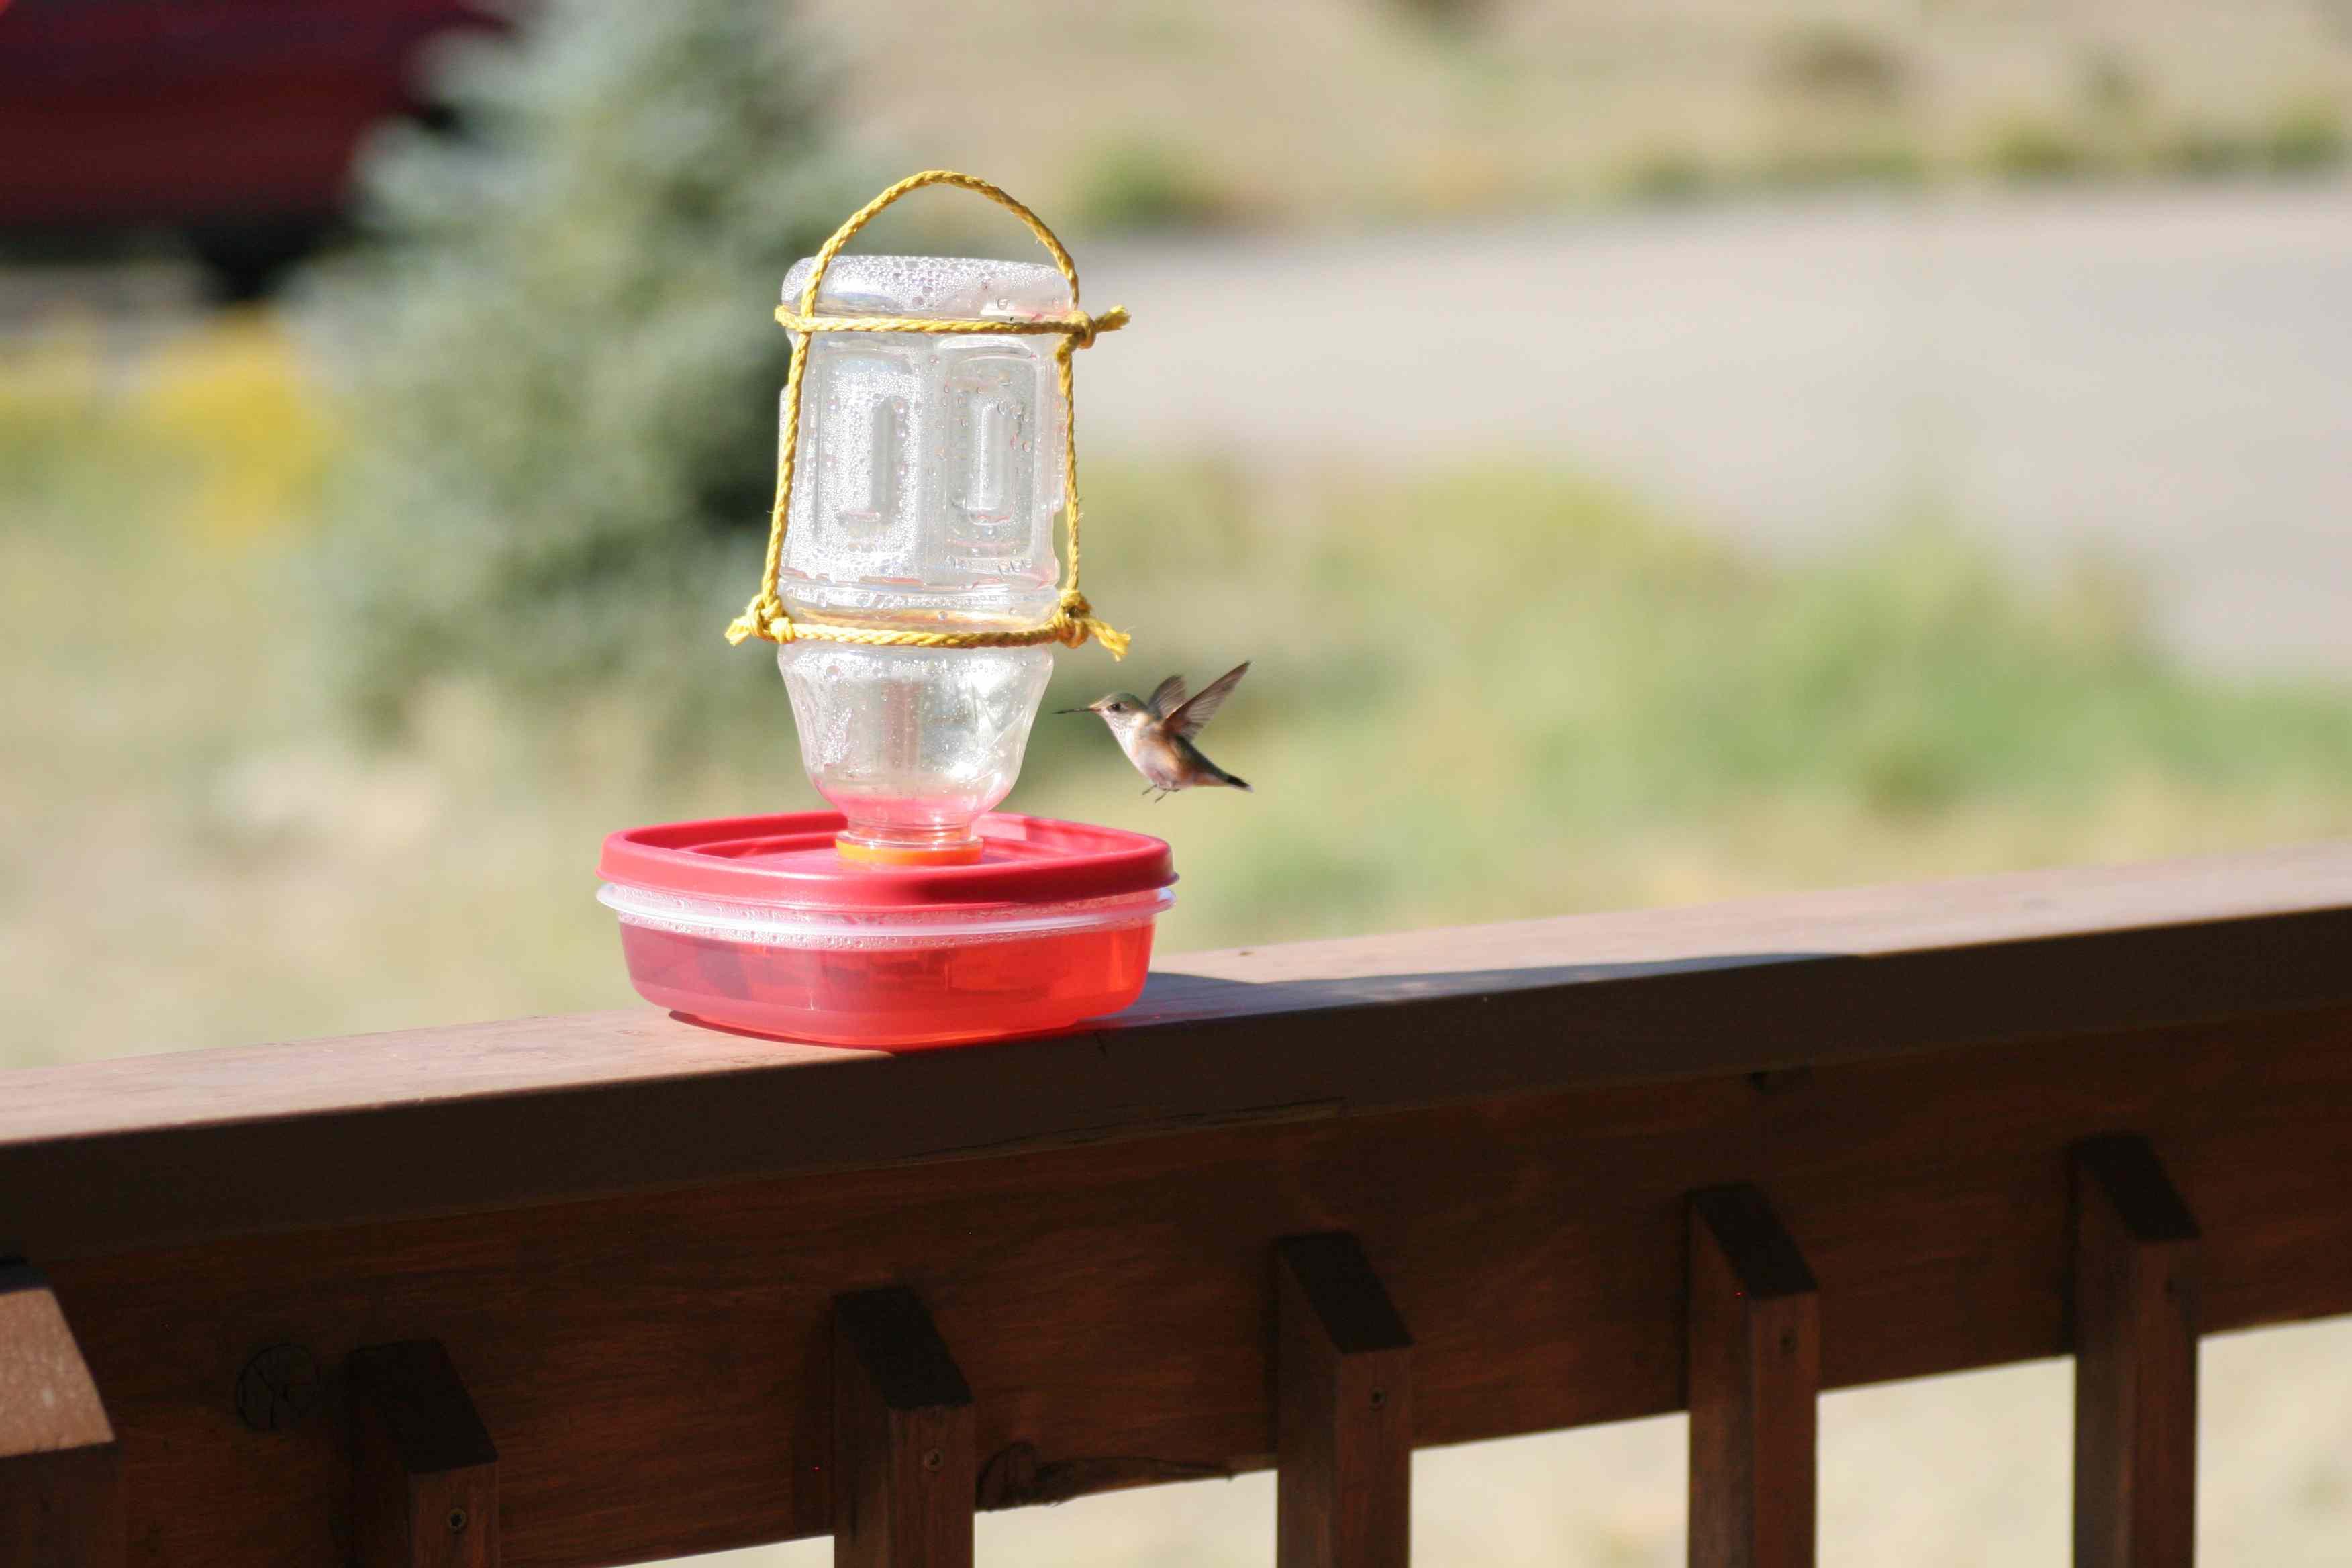 A red hummingbird feeder with a hummingbird